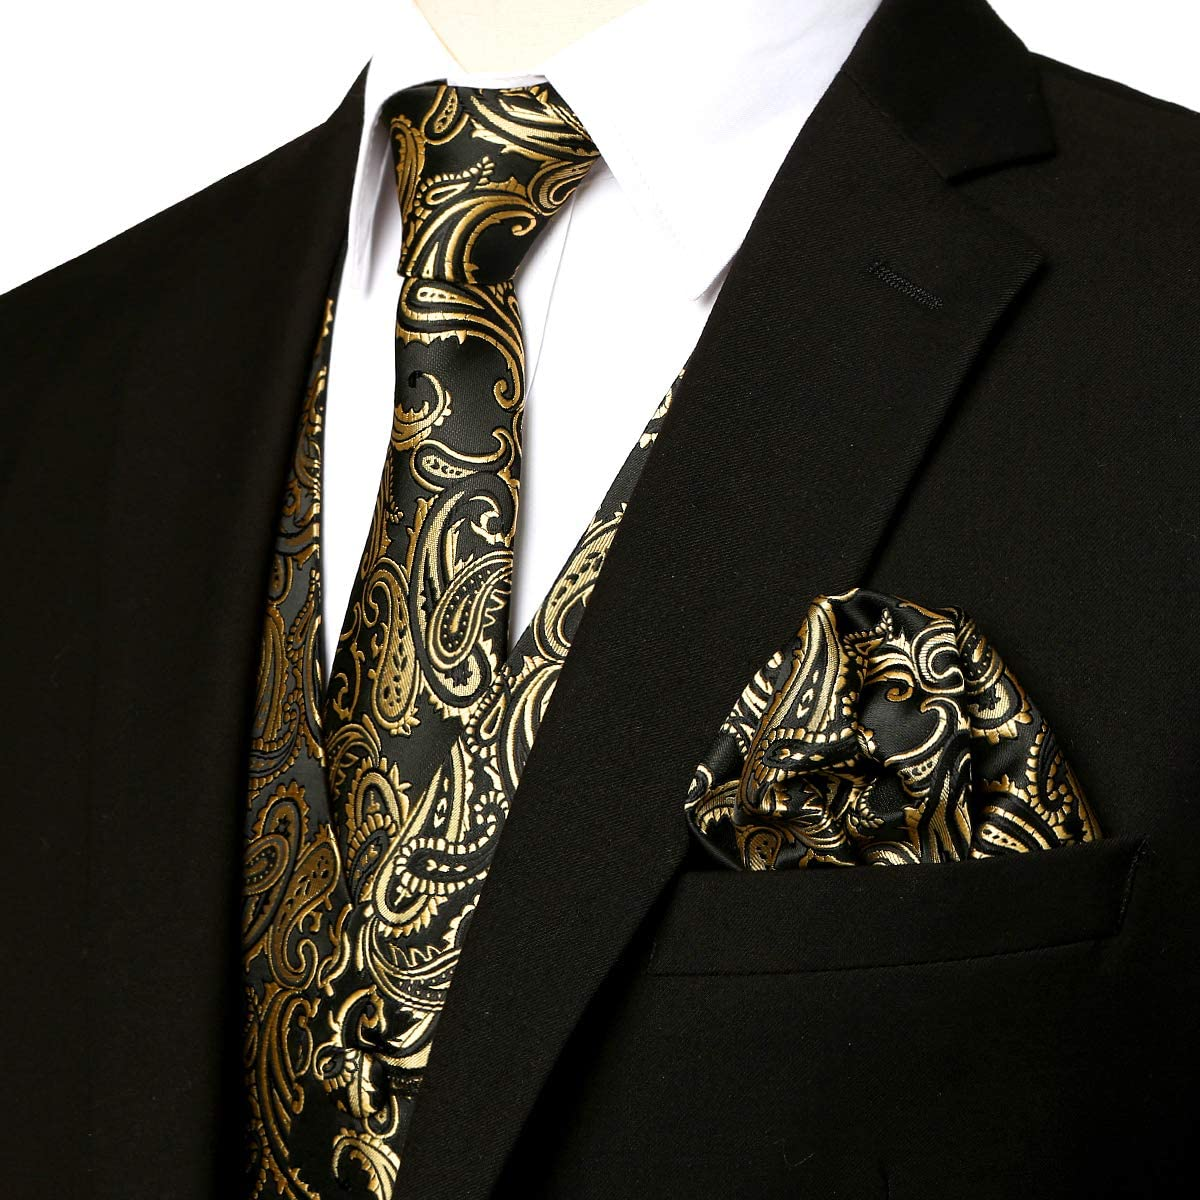 ZEROYAA Men's Classic 3pc Paisley Set Vest Jacquard Genuine Free Shipping Ranking integrated 1st place Pock Necktie